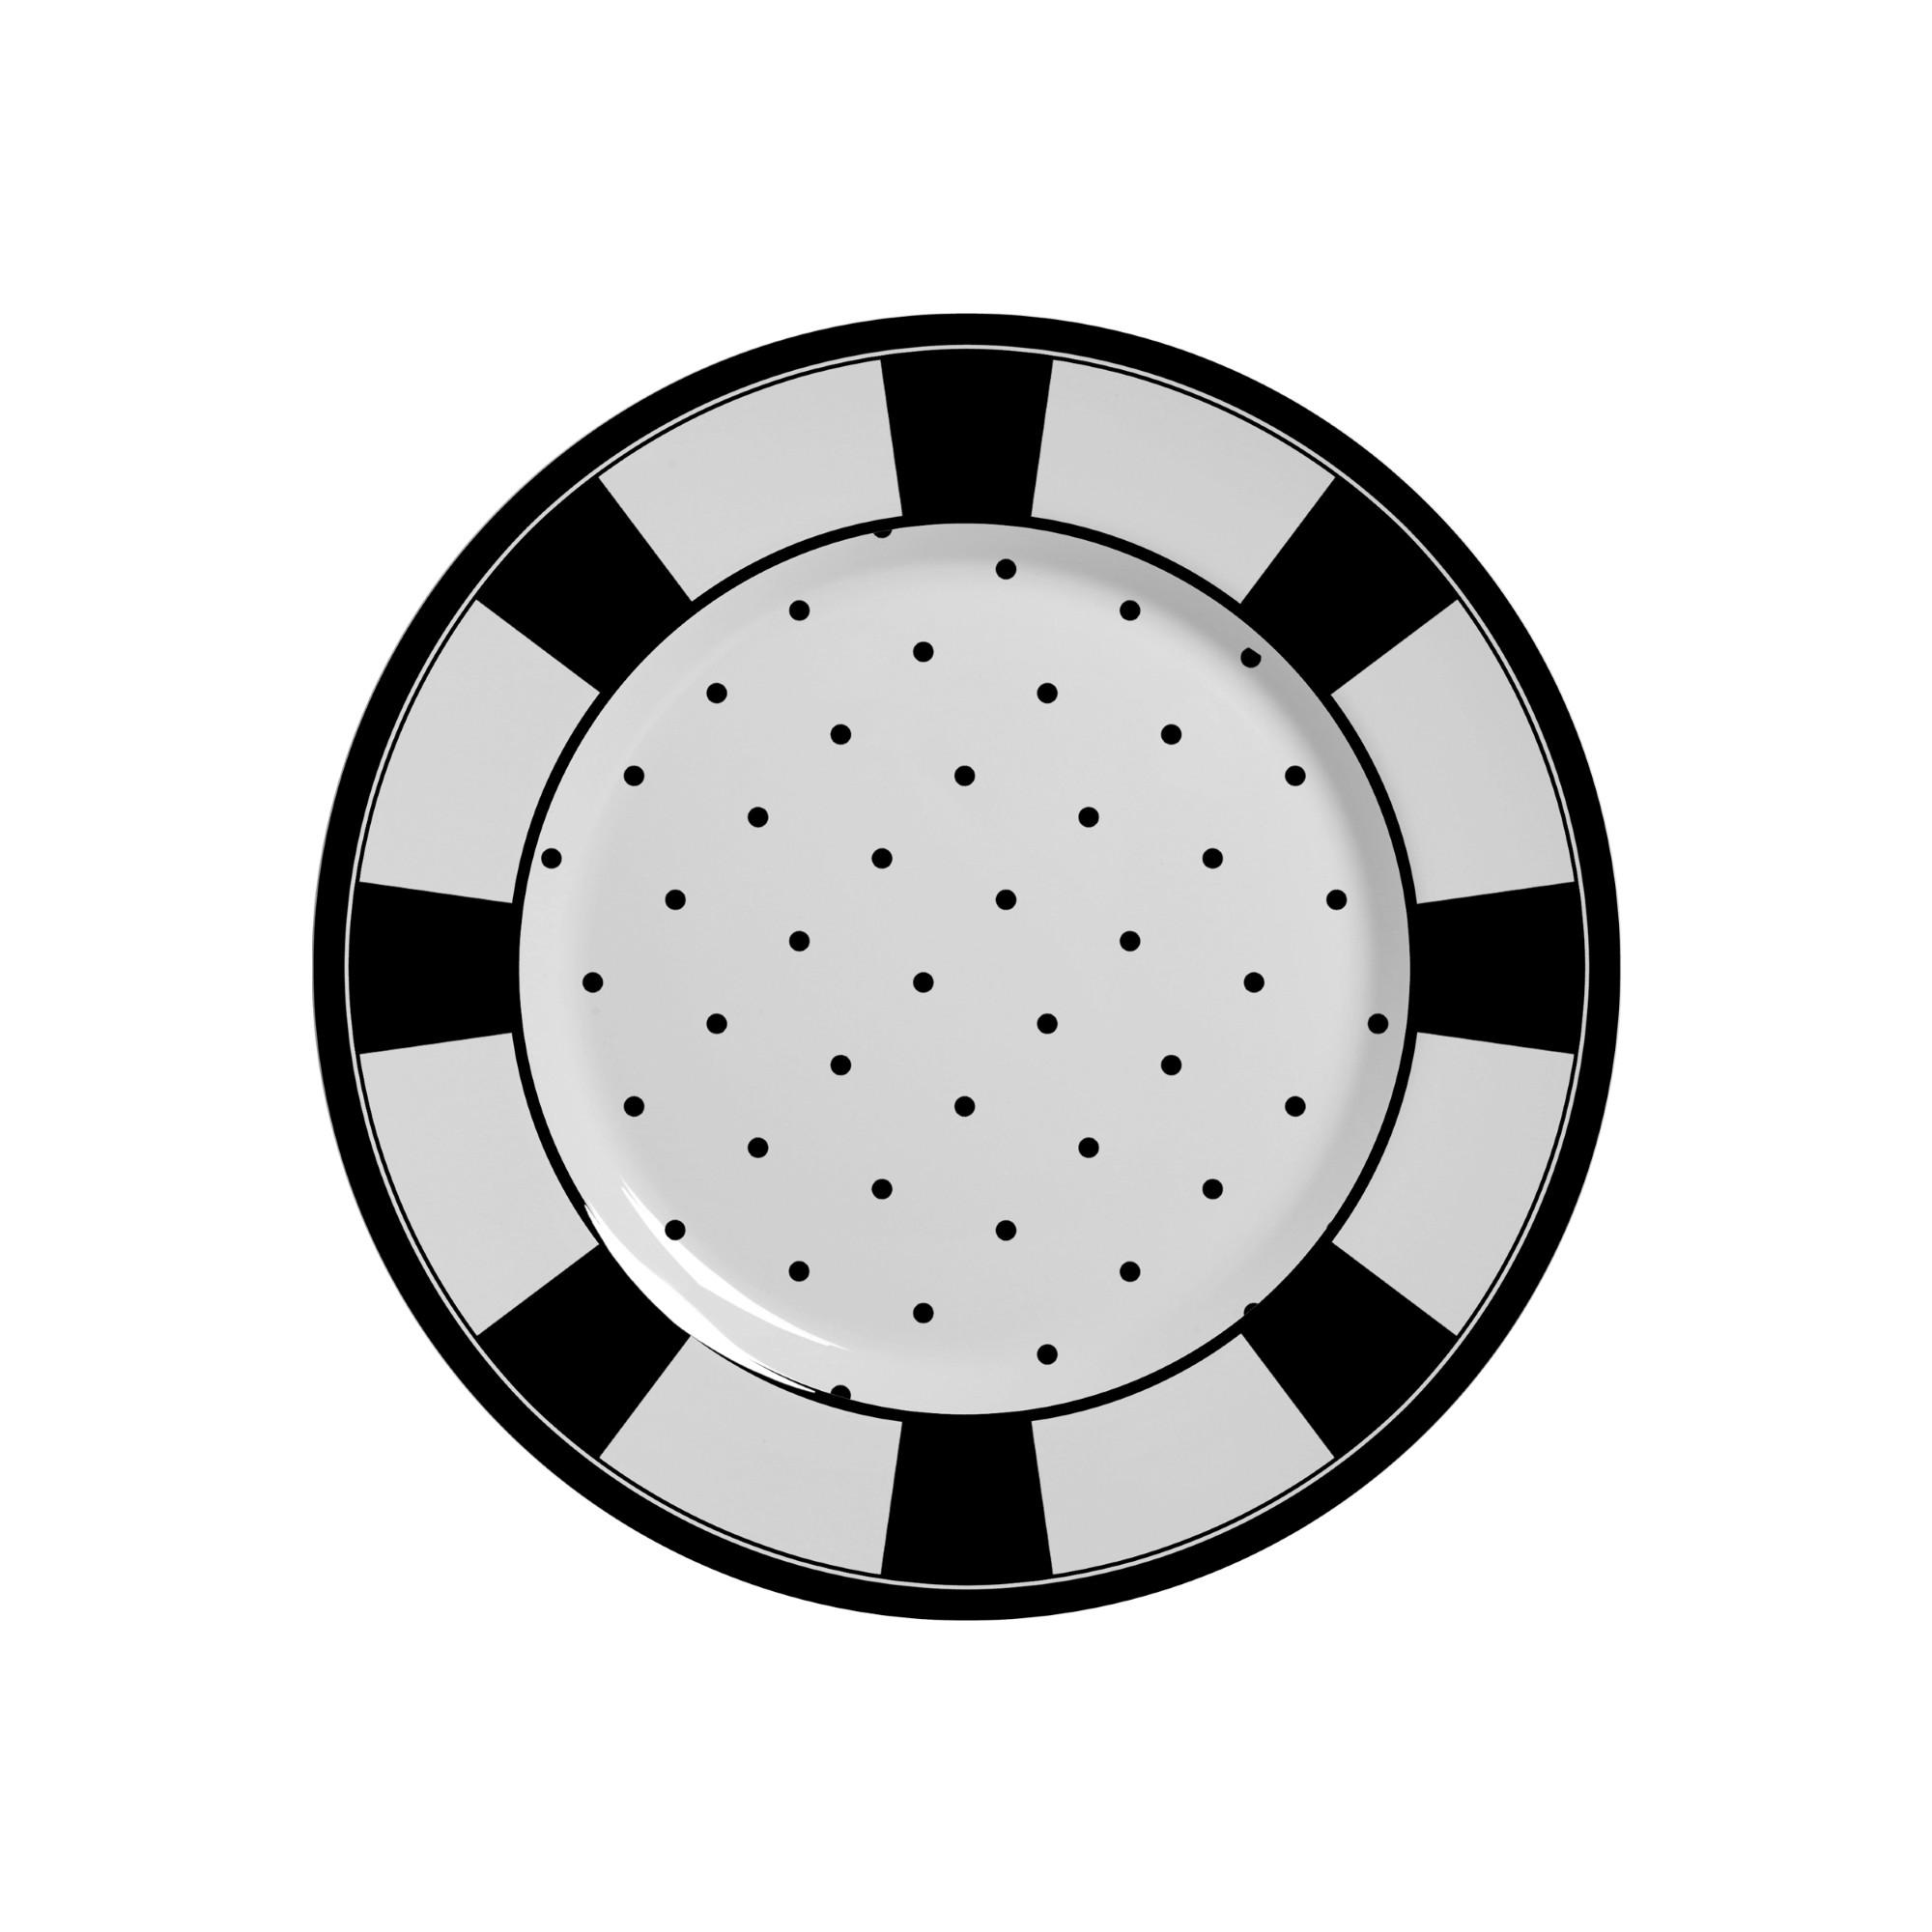 Prato de Sobremesa em Ceramica Petit Pois Preto 19cm - Alleanza